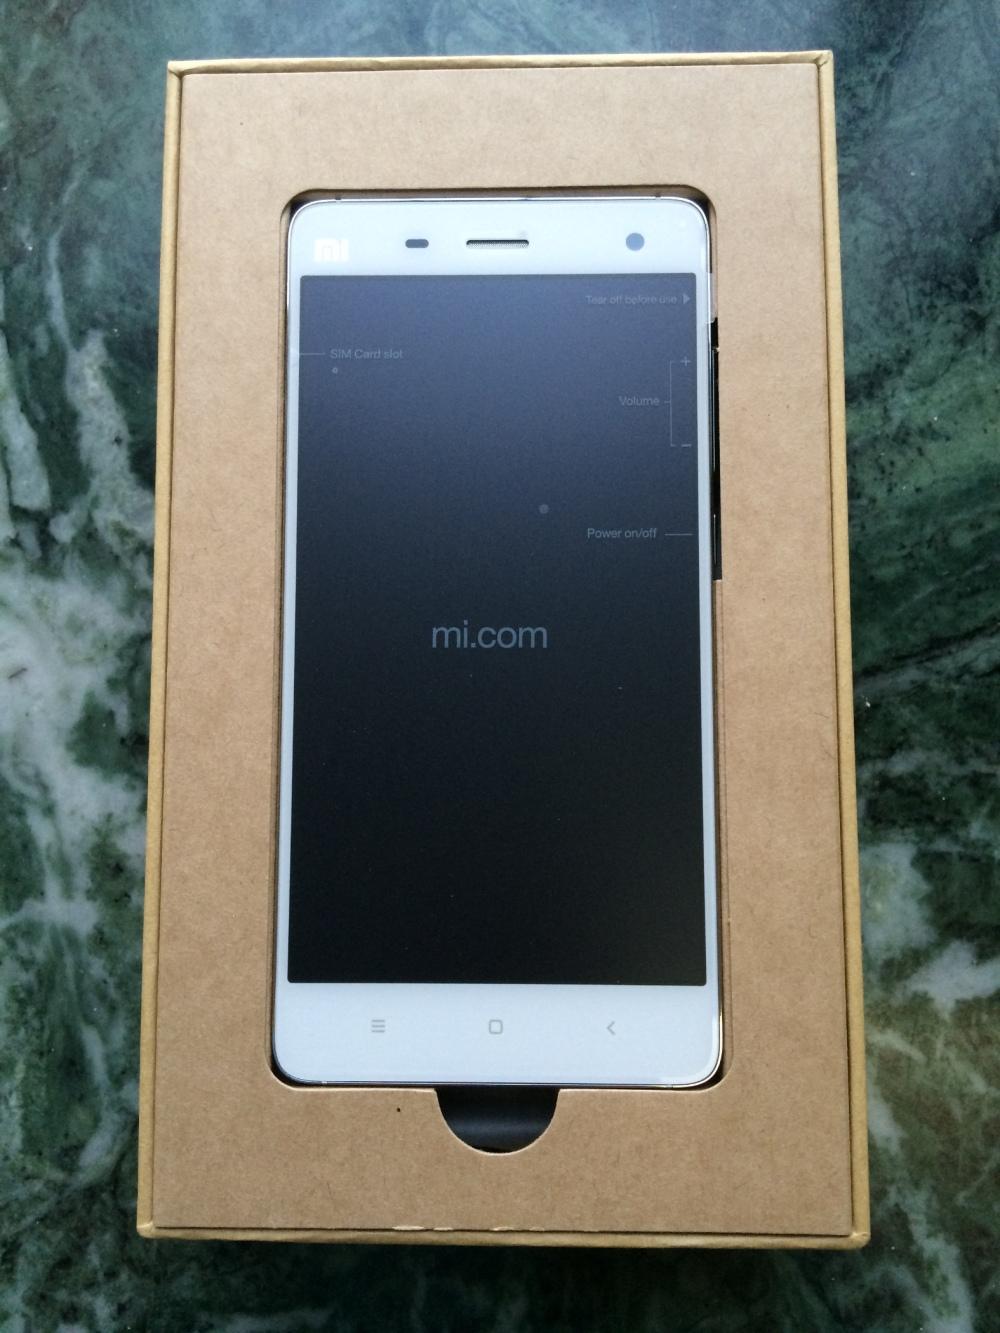 Xiaomi Mi 4 unboxed